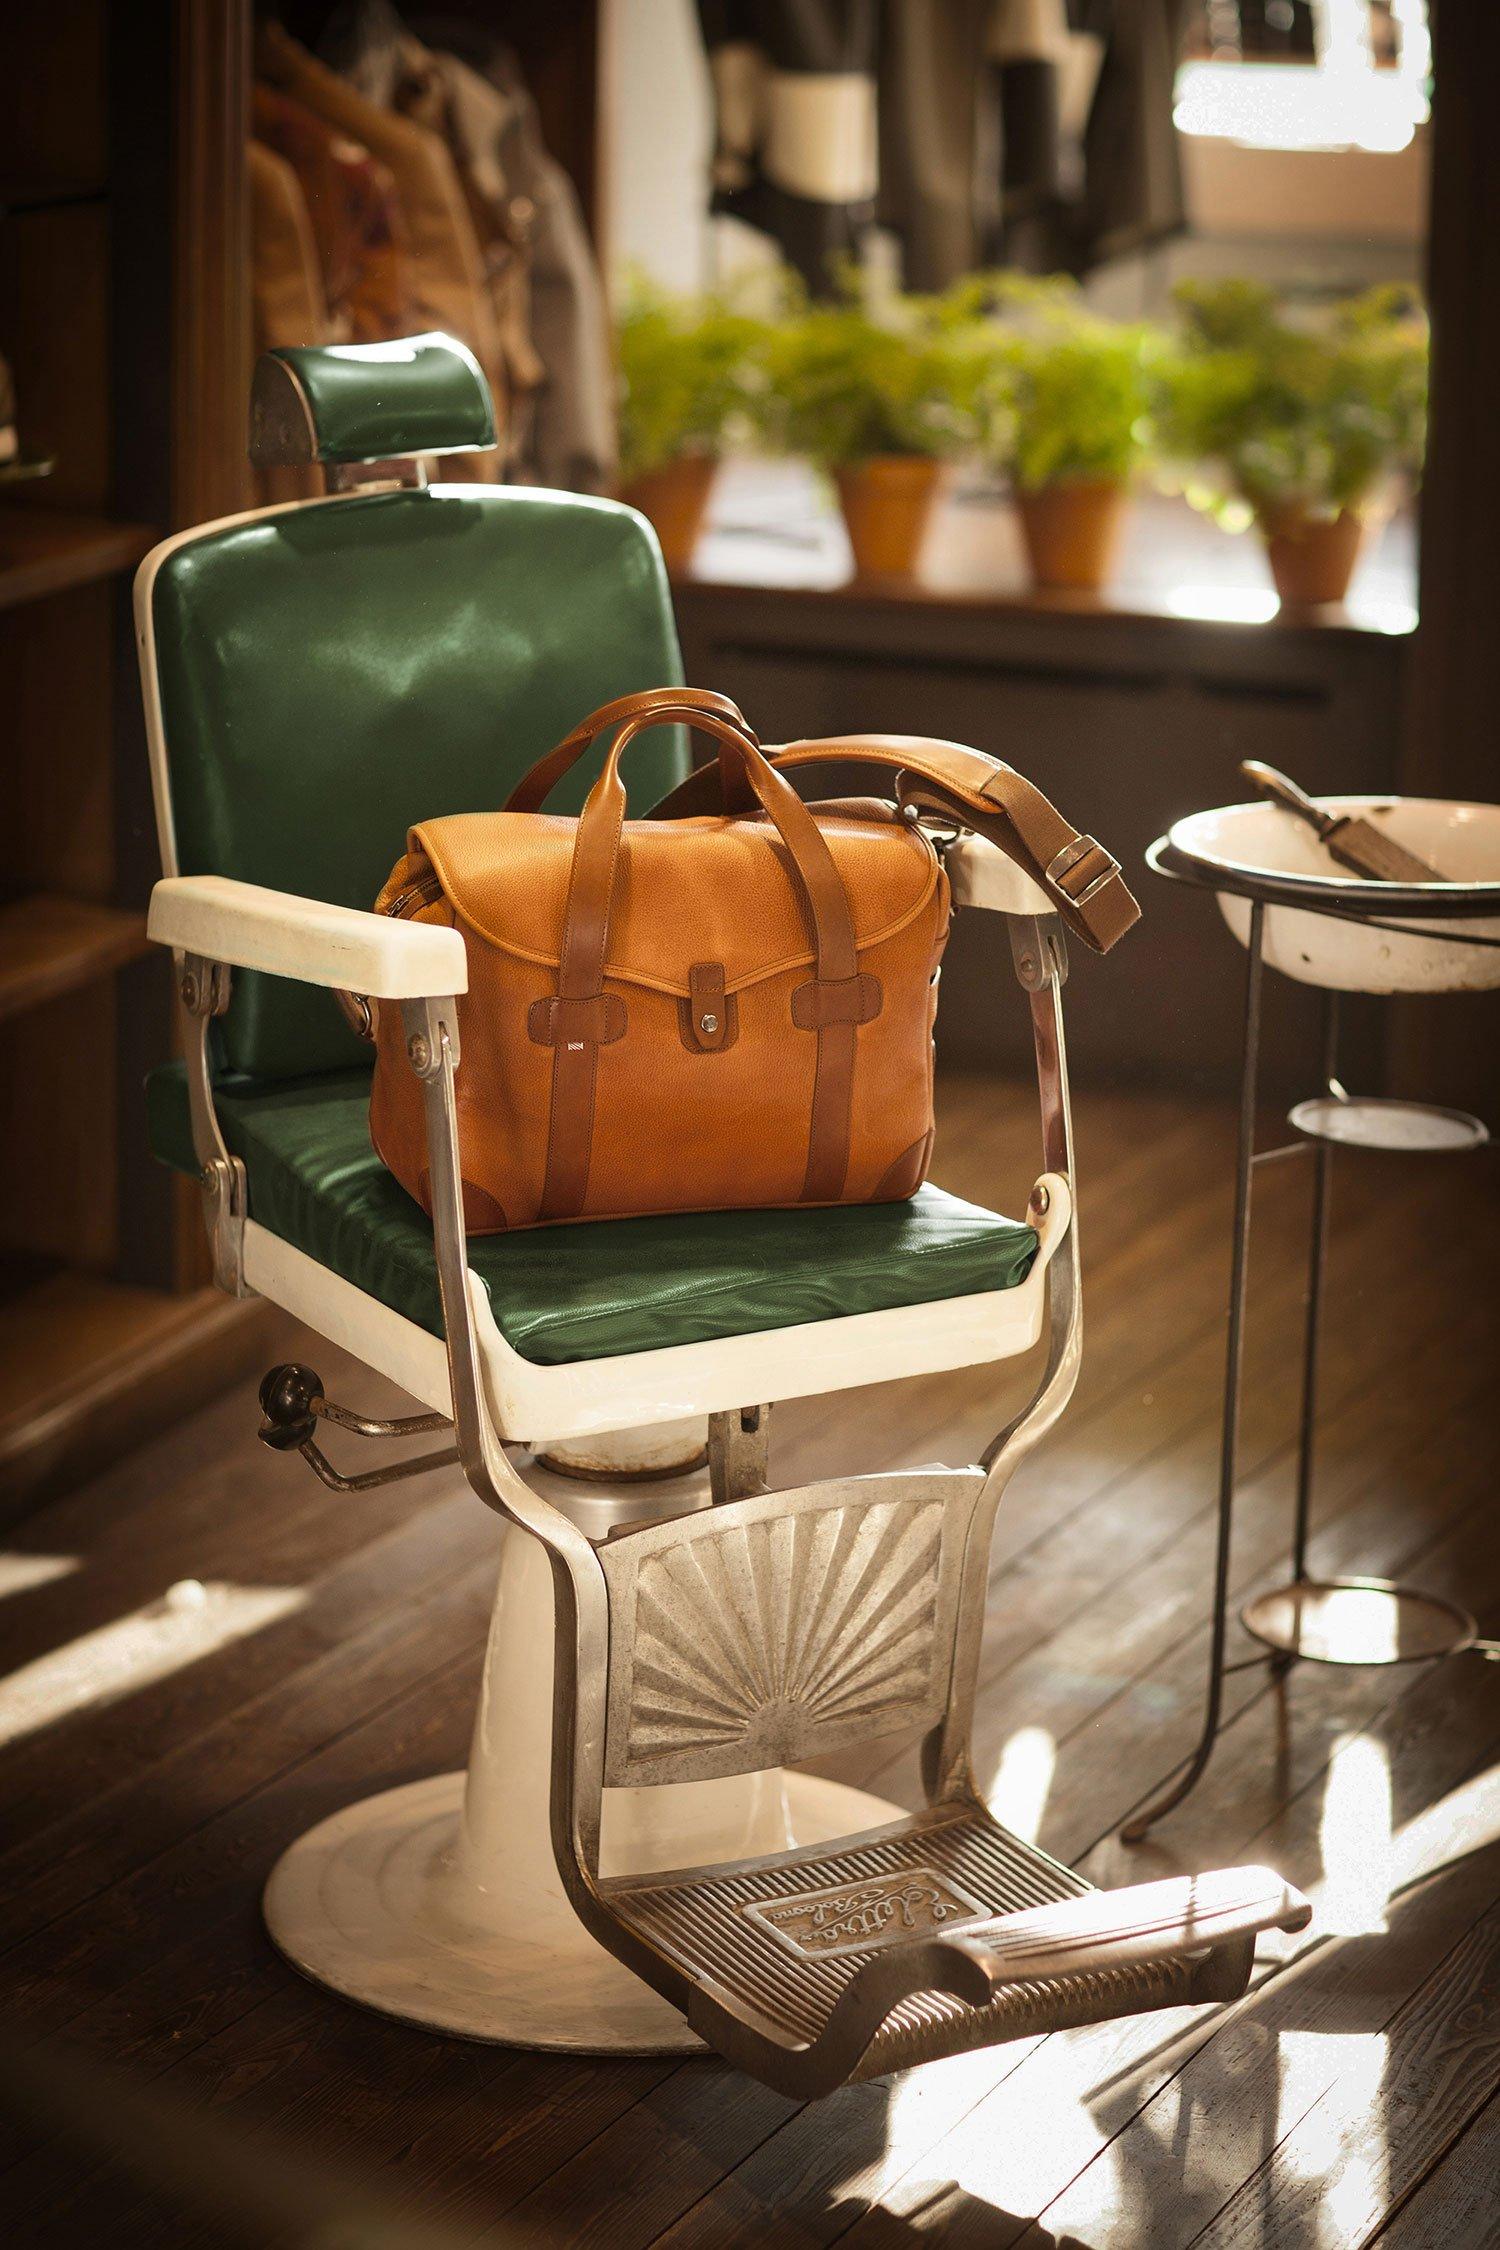 Barber Shop Italian Leather Goods